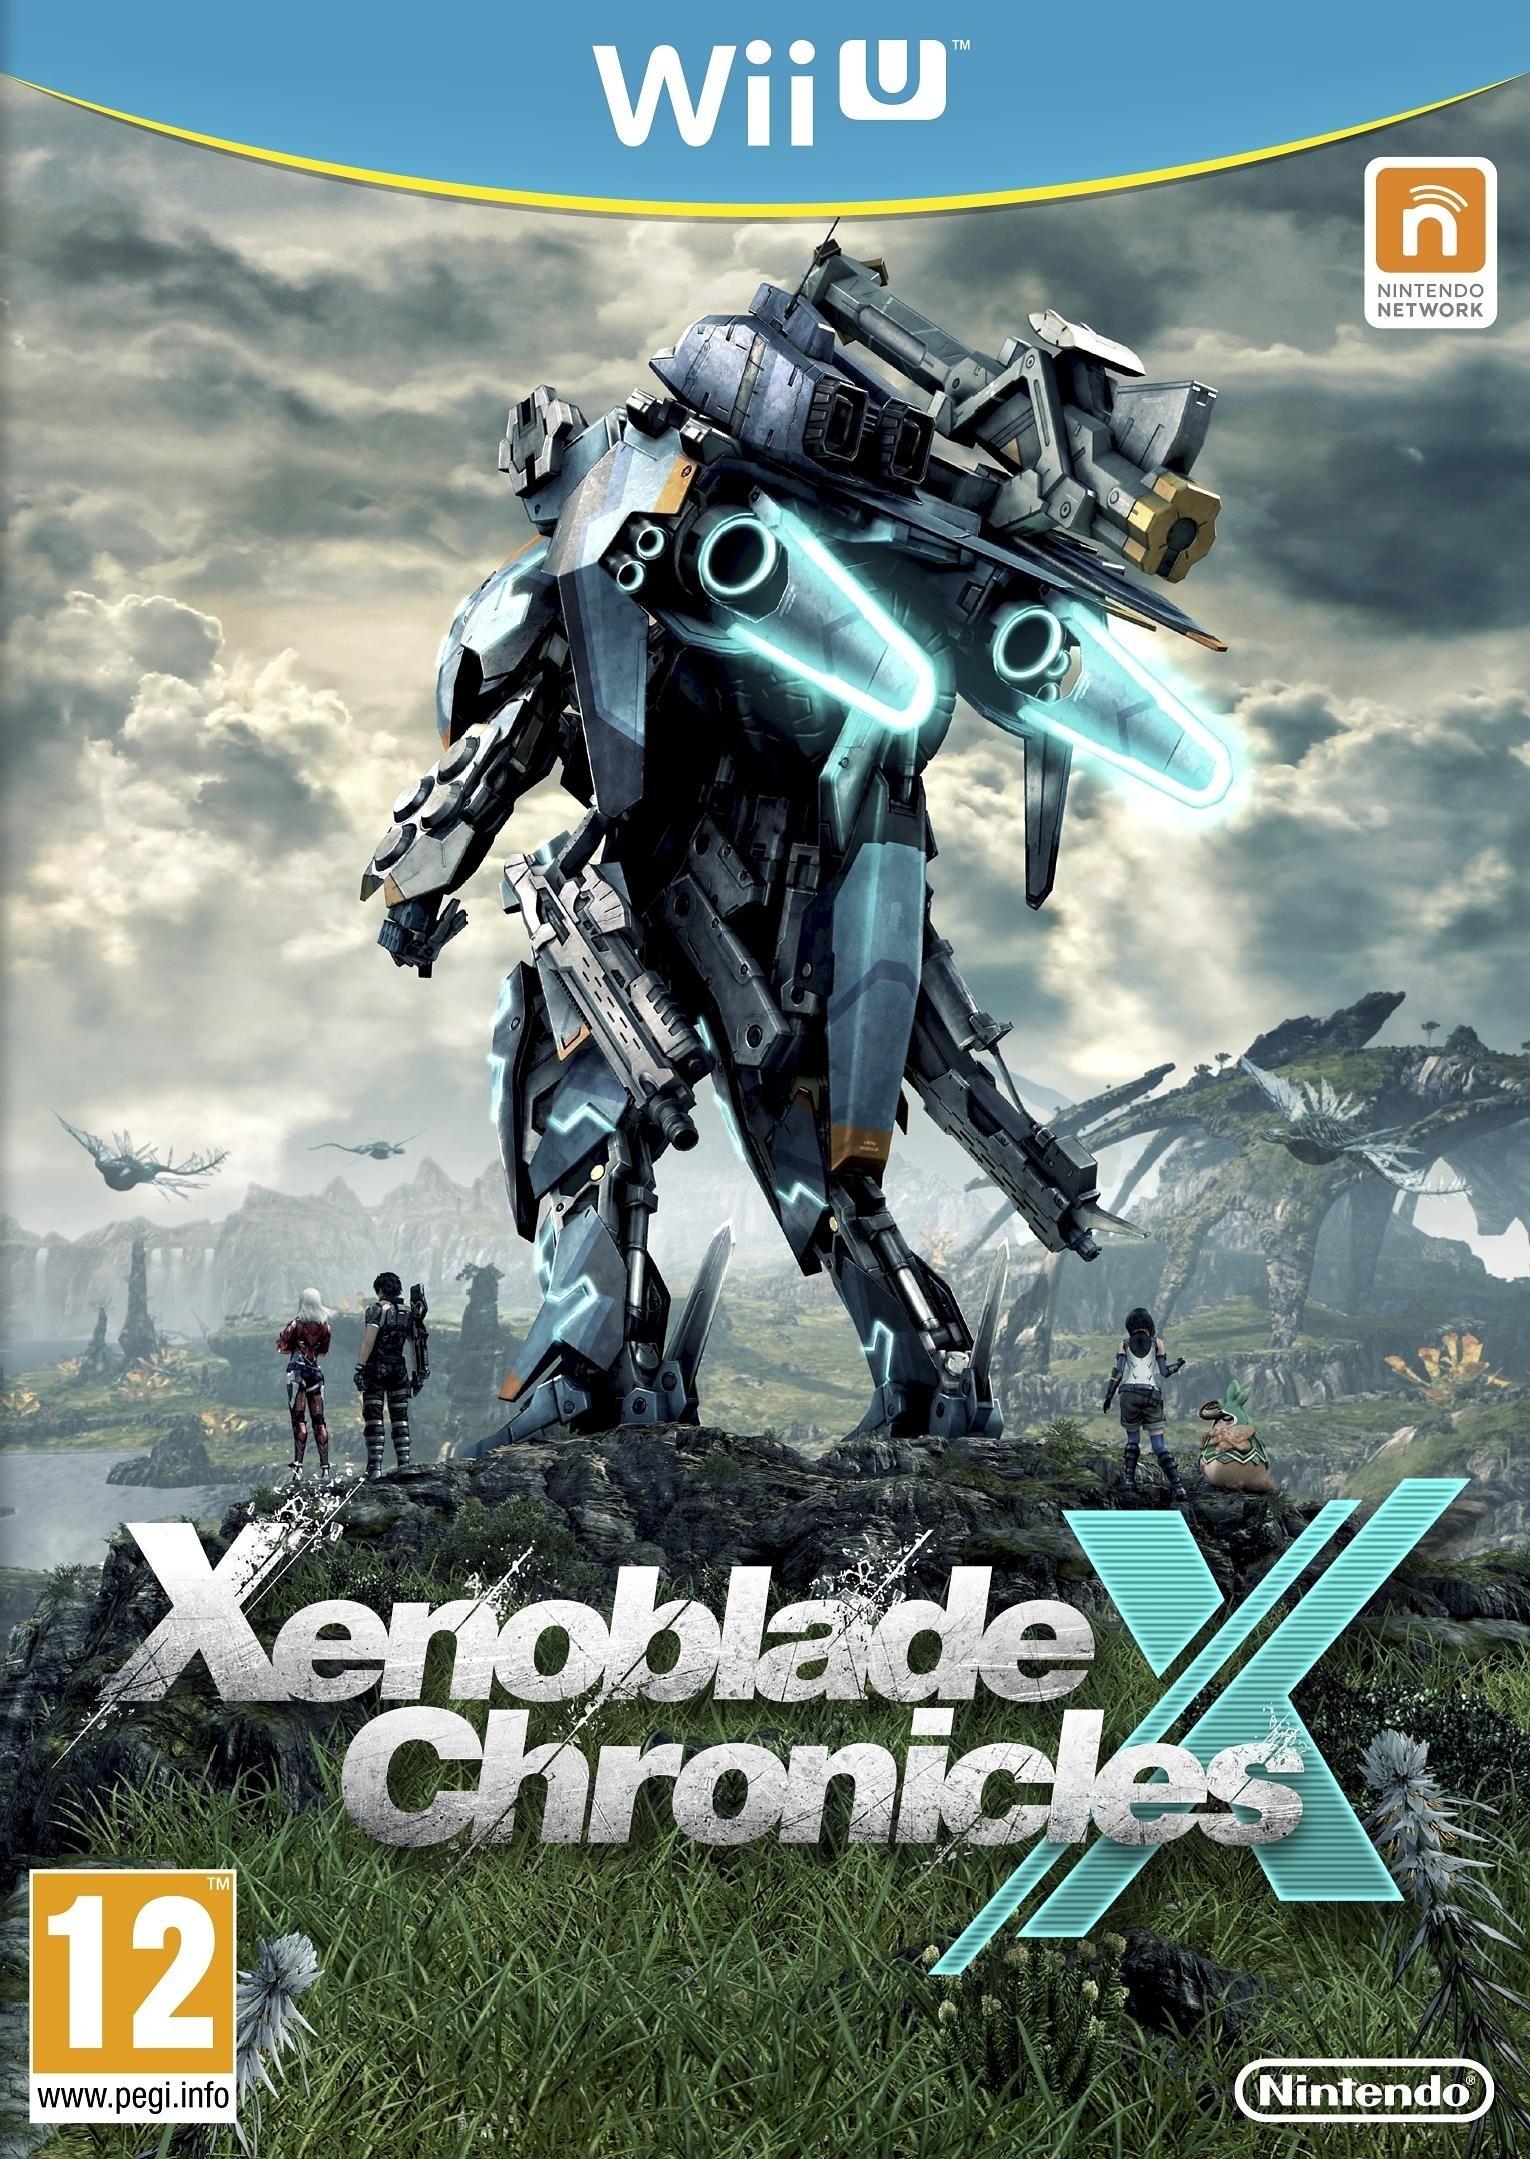 NINTENDO Wii U, Xenoblade Chronicles X veilig op otto.nl kopen